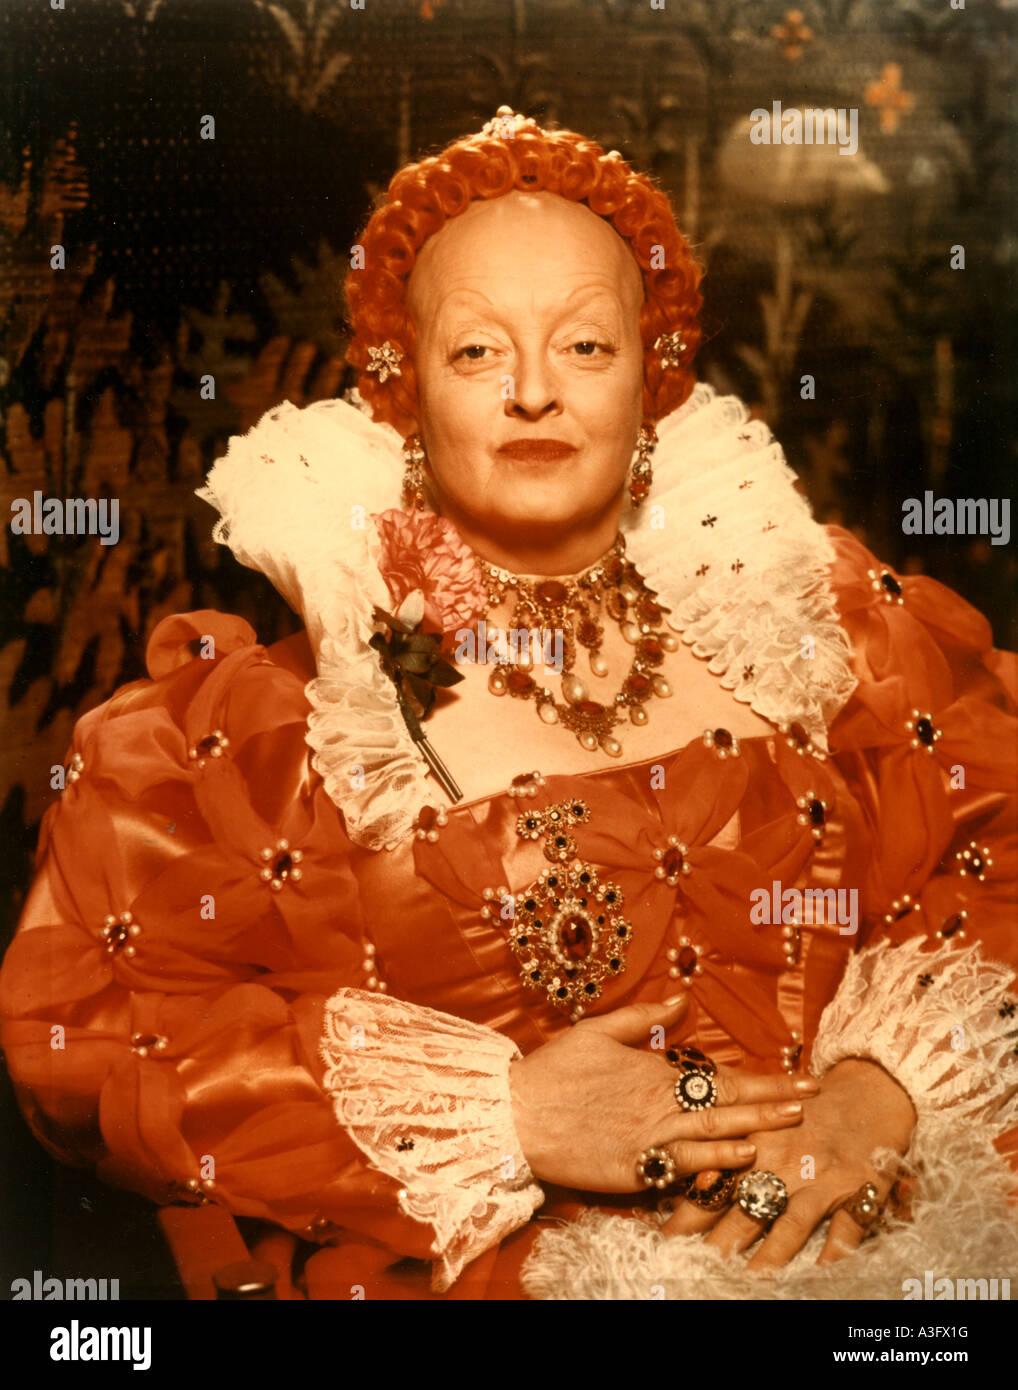 virgin queen 1955 tcf film with bette davis as elizabeth i